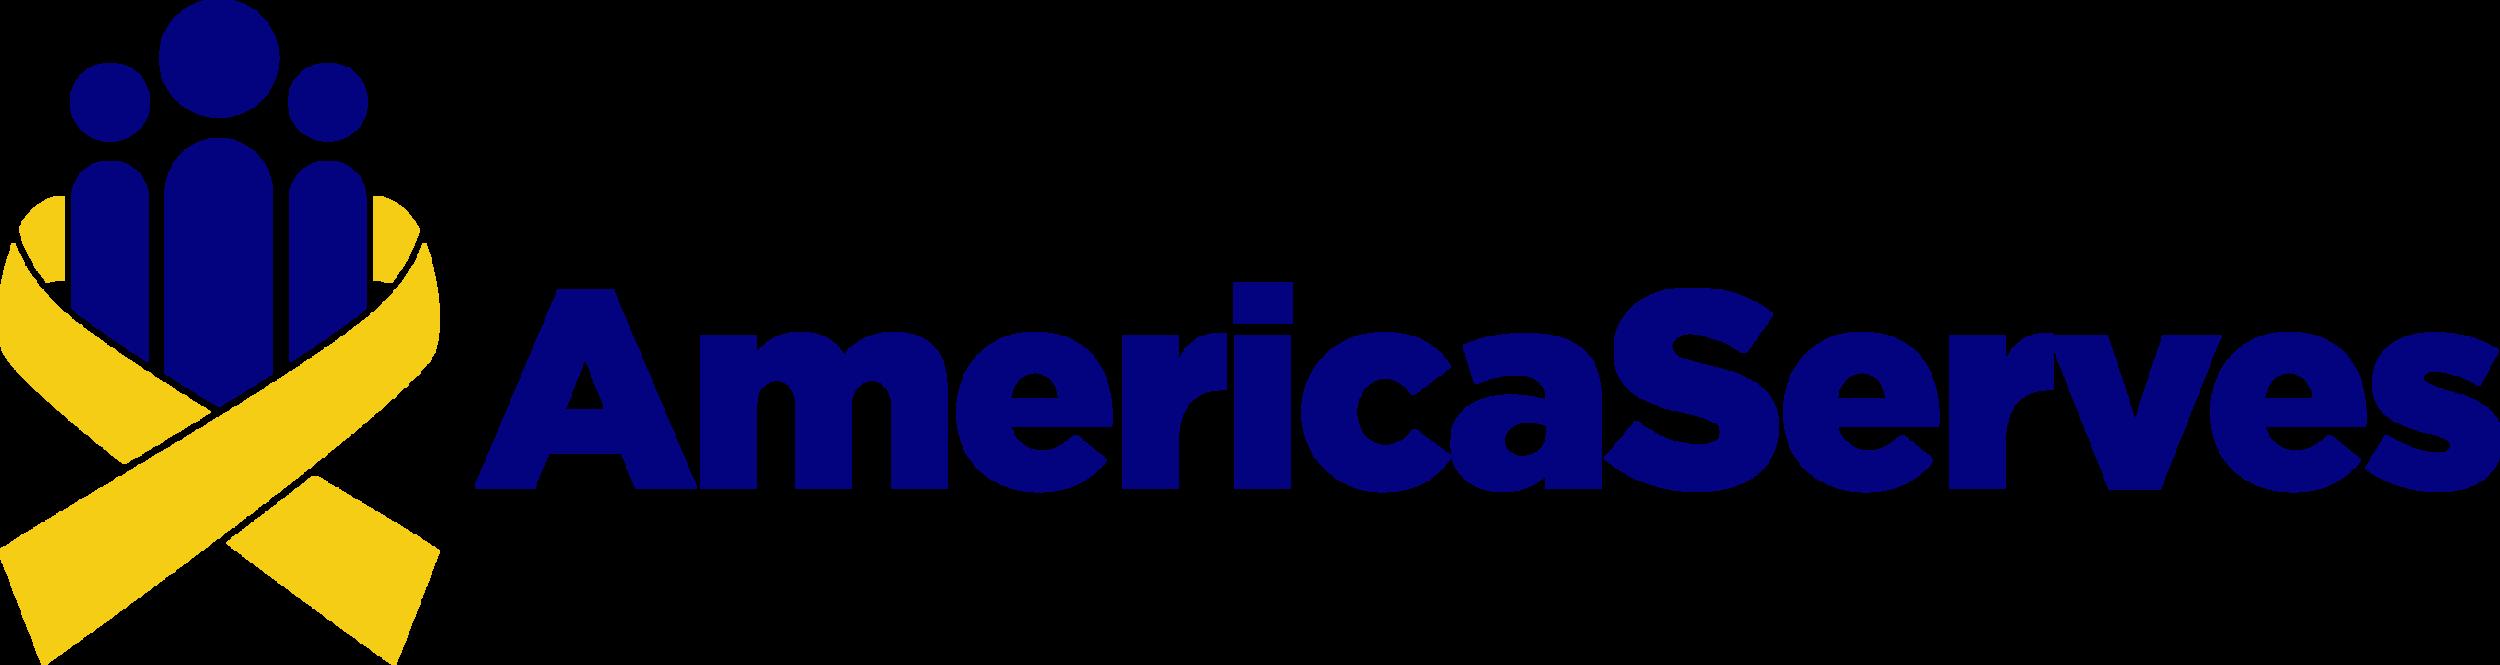 AmericaServes_Logo_(RGB).png